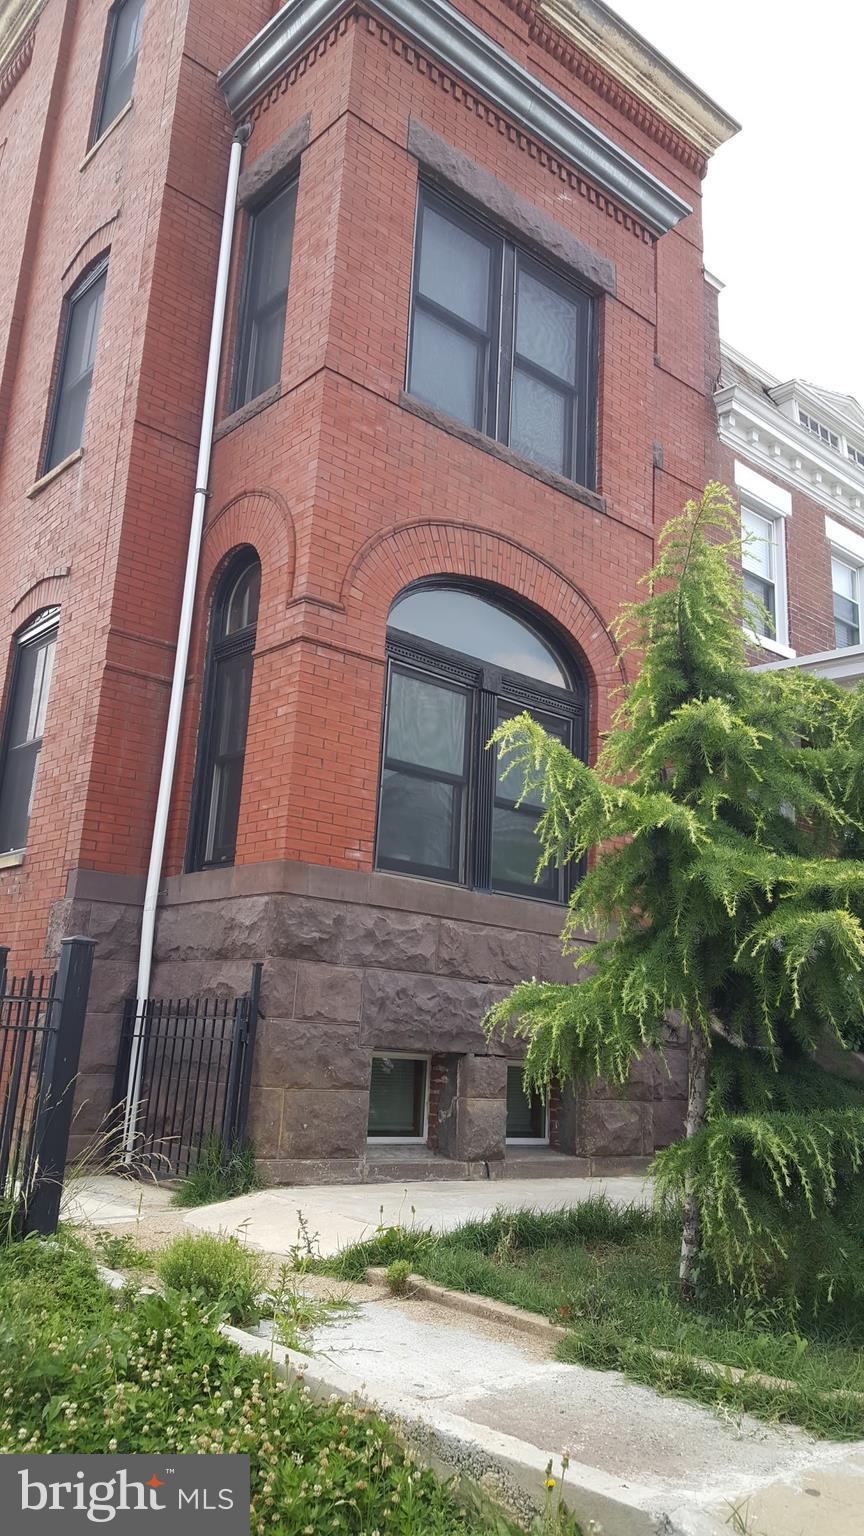 1822 4TH STREET NW, WASHINGTON, DC 20001